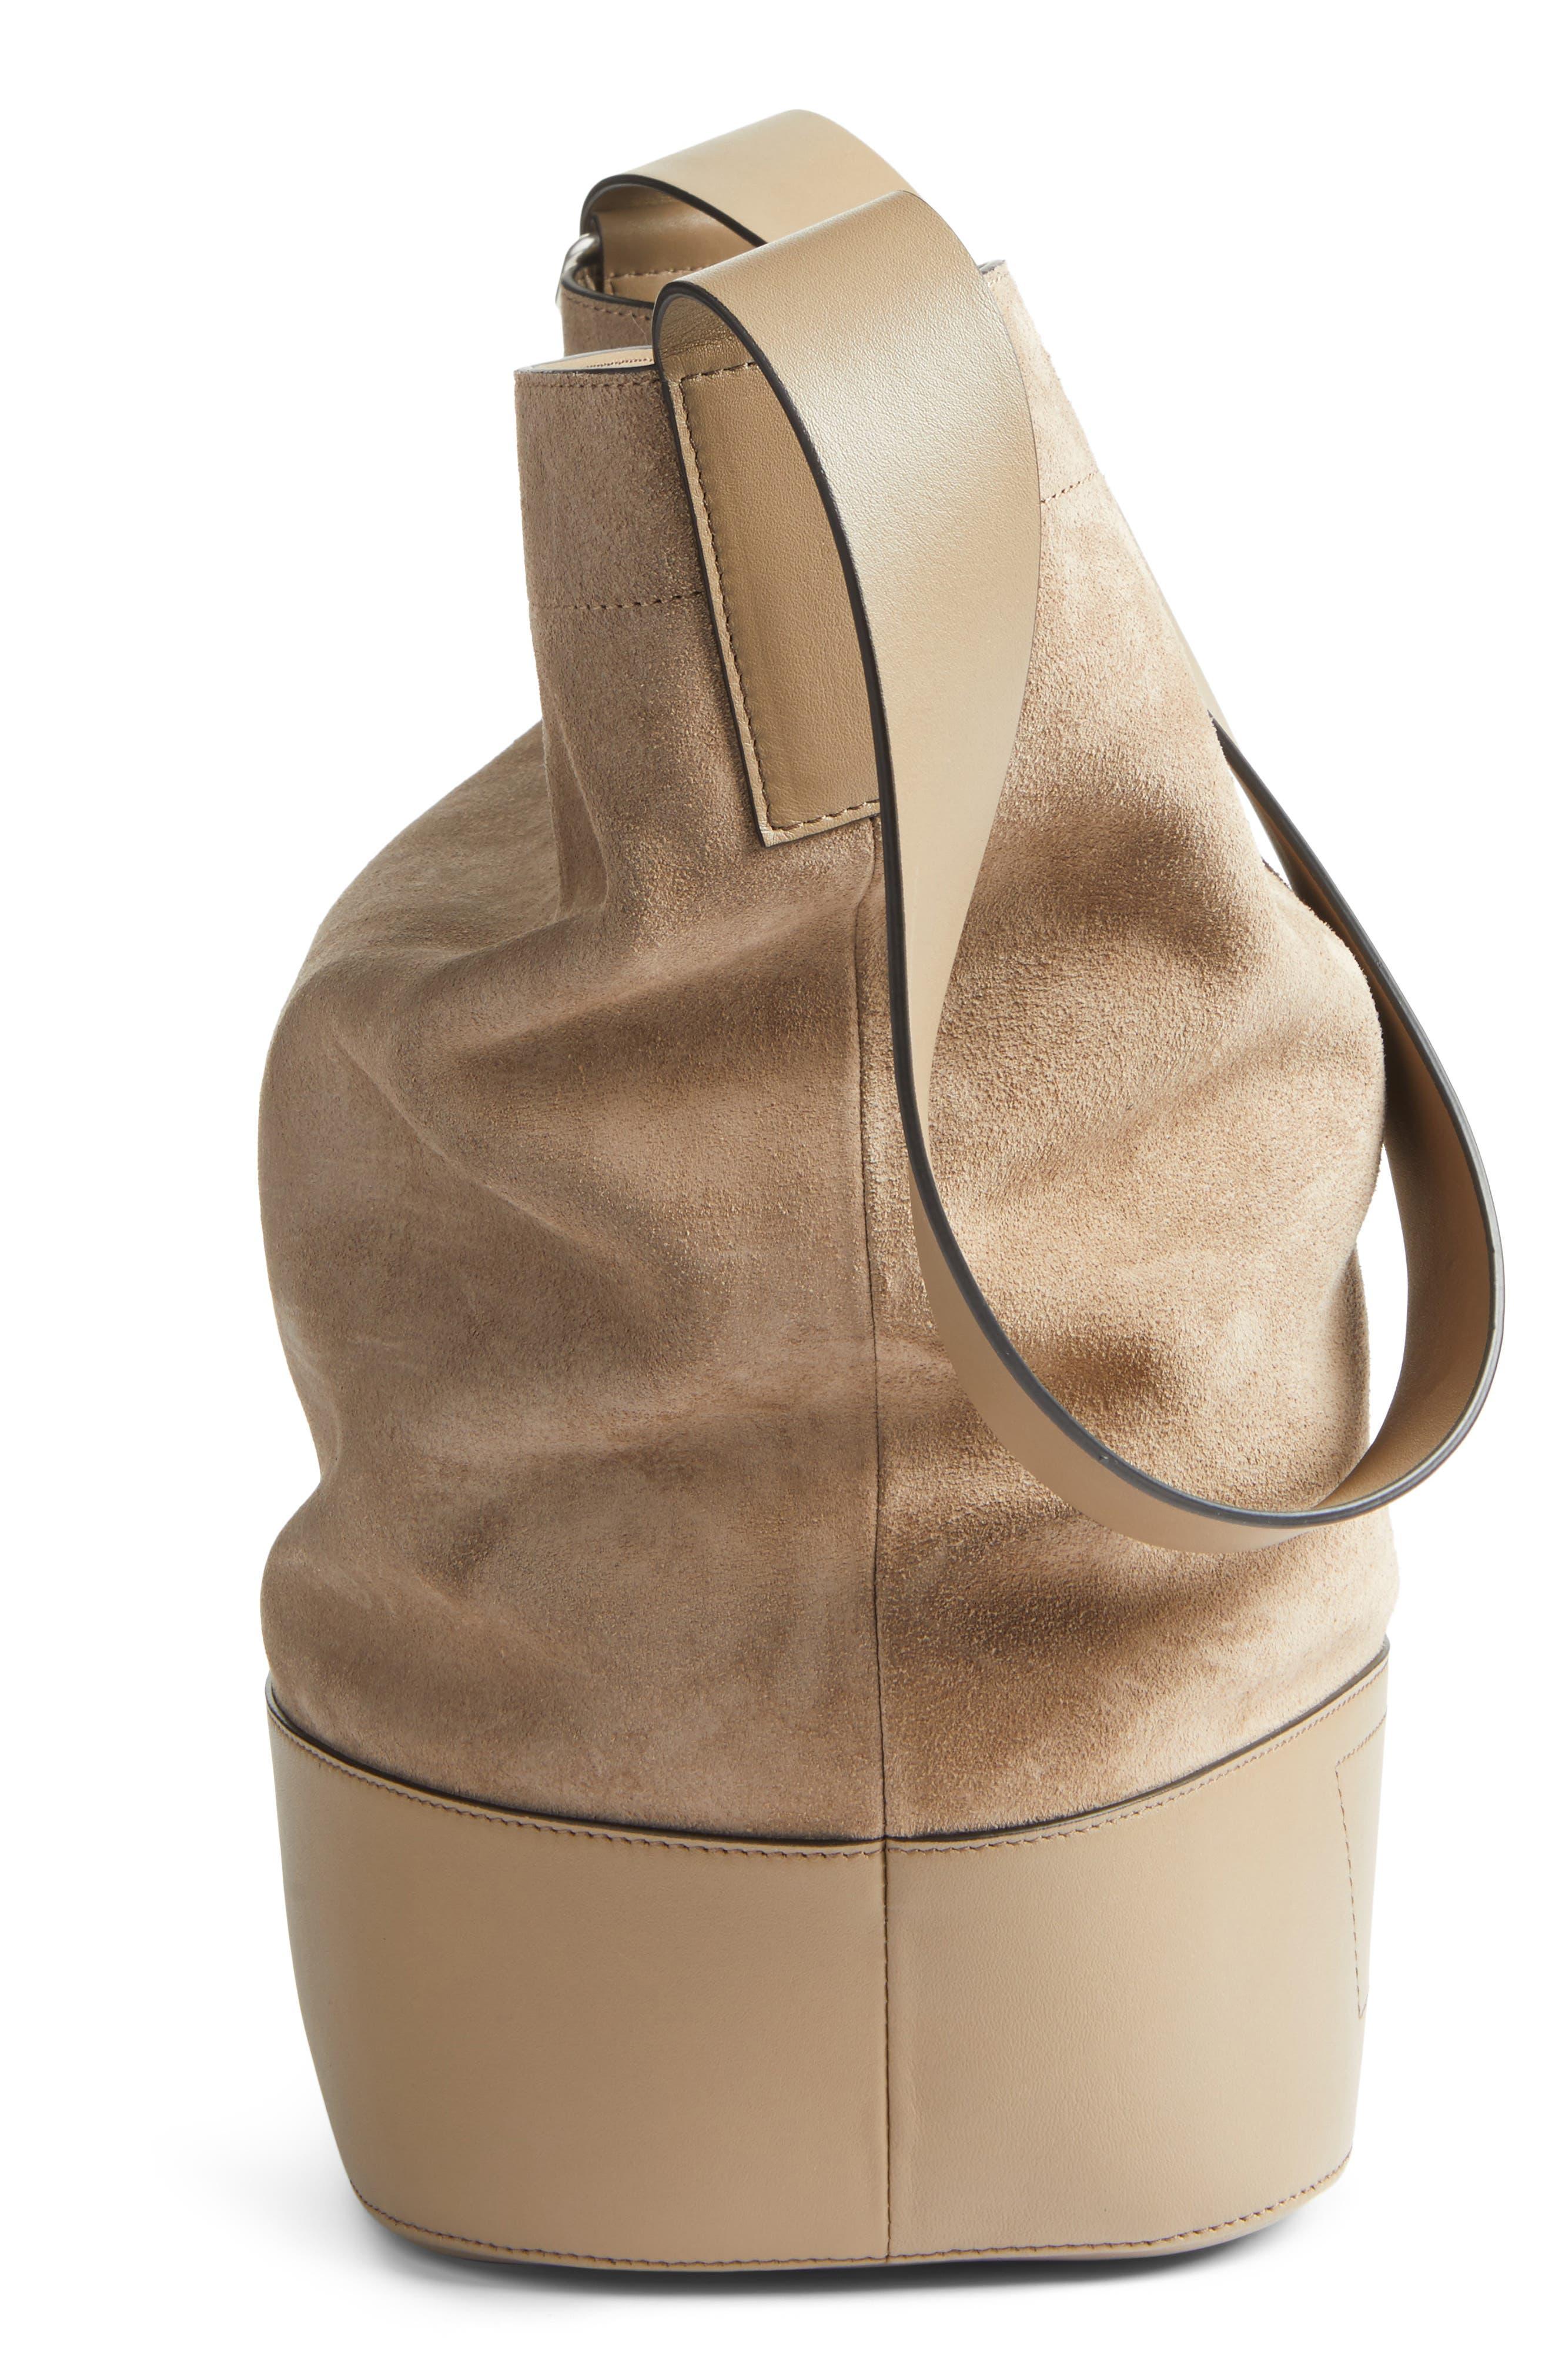 rag and bone Walker Sling Leather & Suede Bucket Bag,                             Alternate thumbnail 4, color,                             099